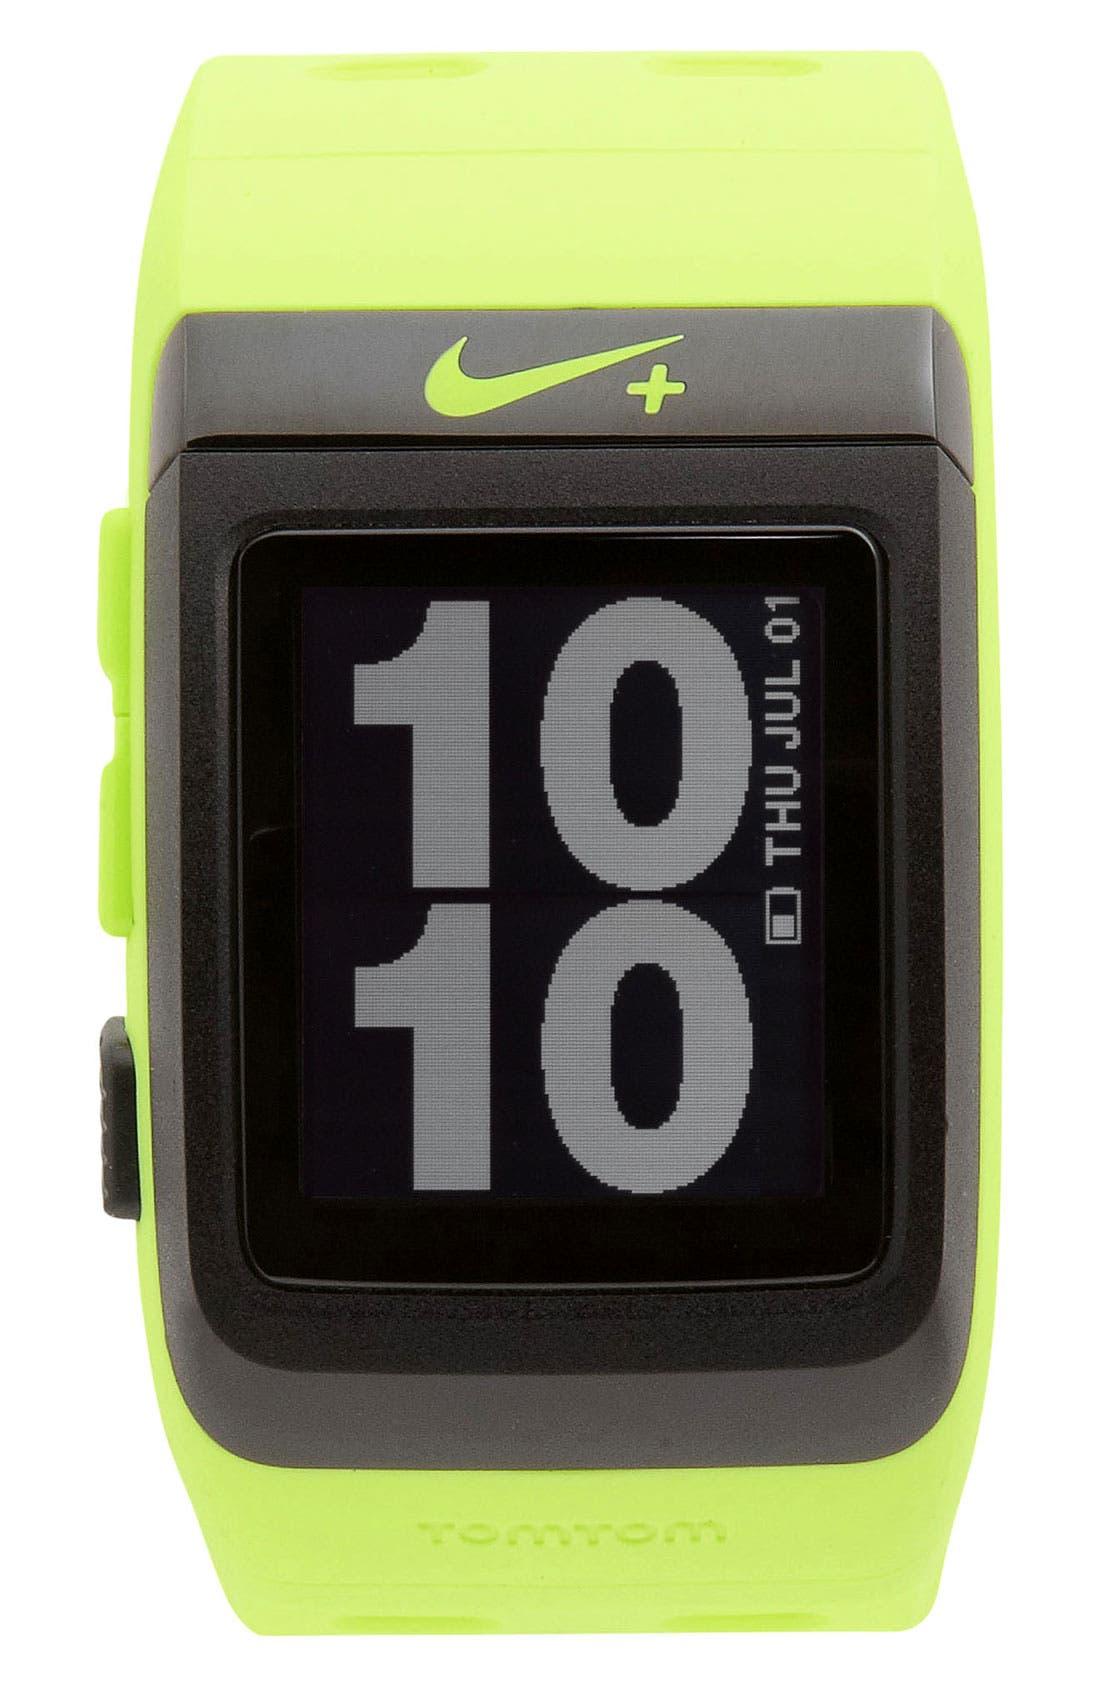 Alternate Image 1 Selected - Nike+ Sport Watch GPS, 35mm x 50mm